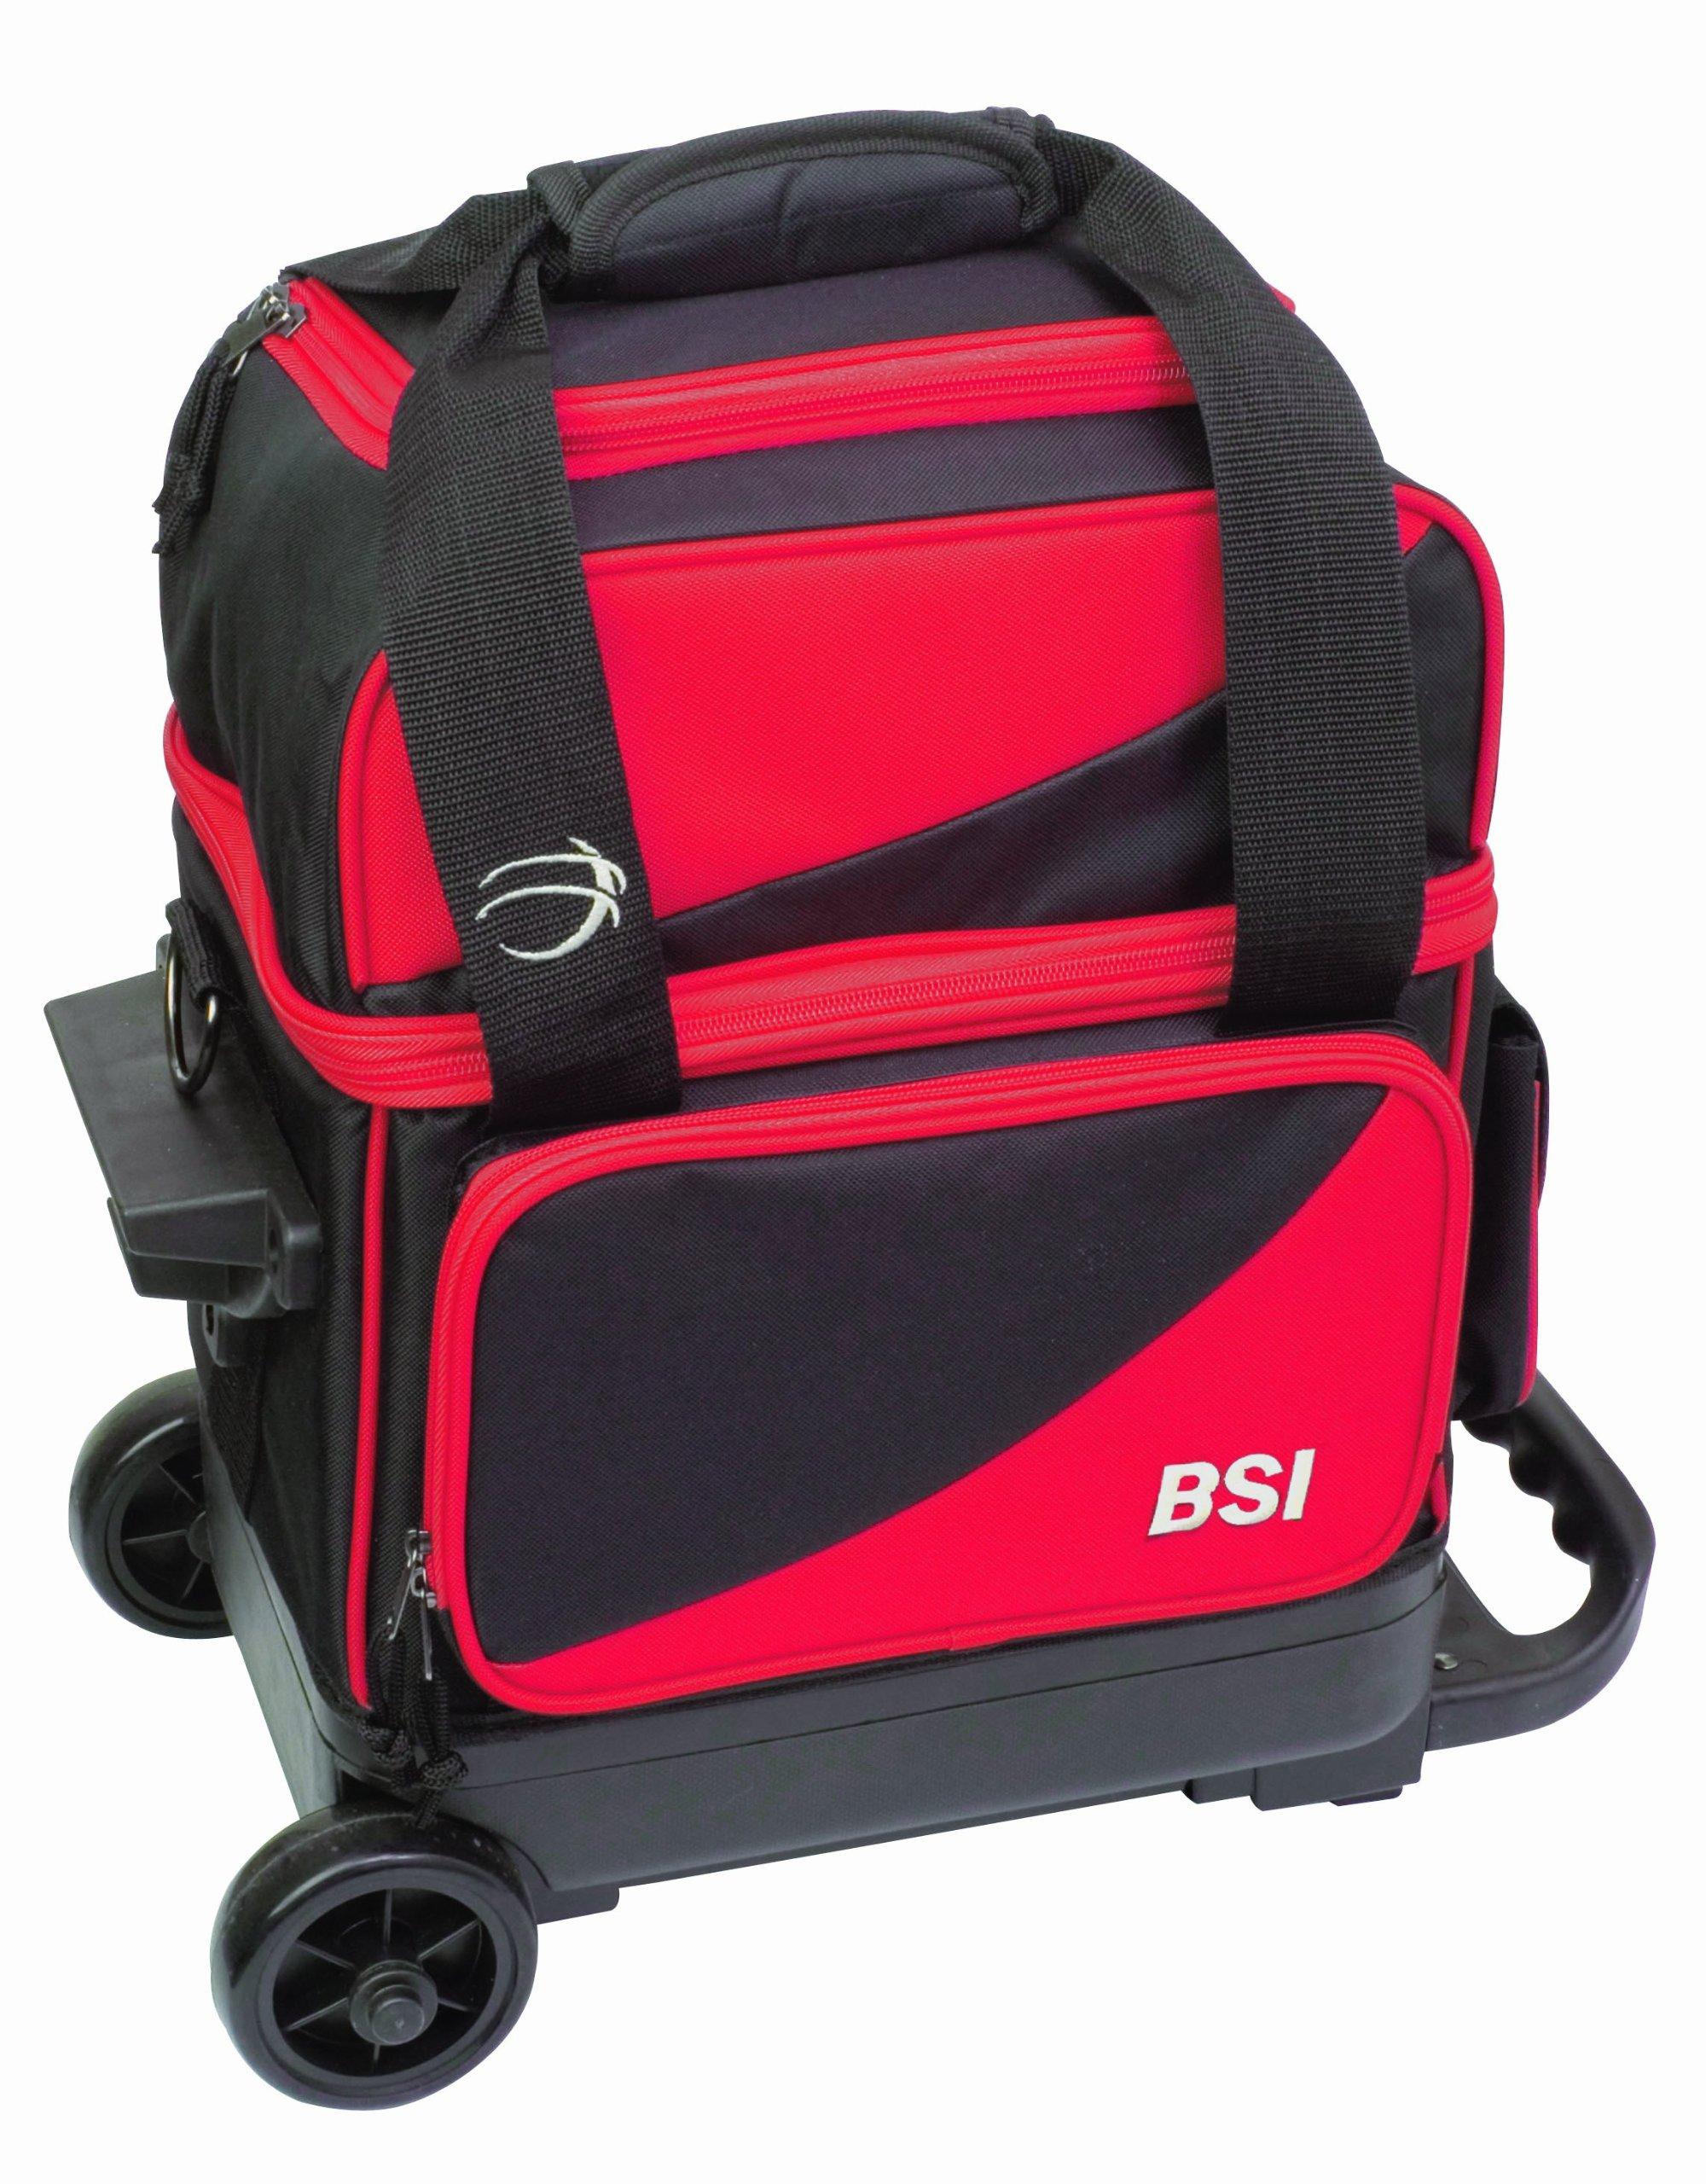 BSI Single Ball Roller Bowling Bag, Black/Red